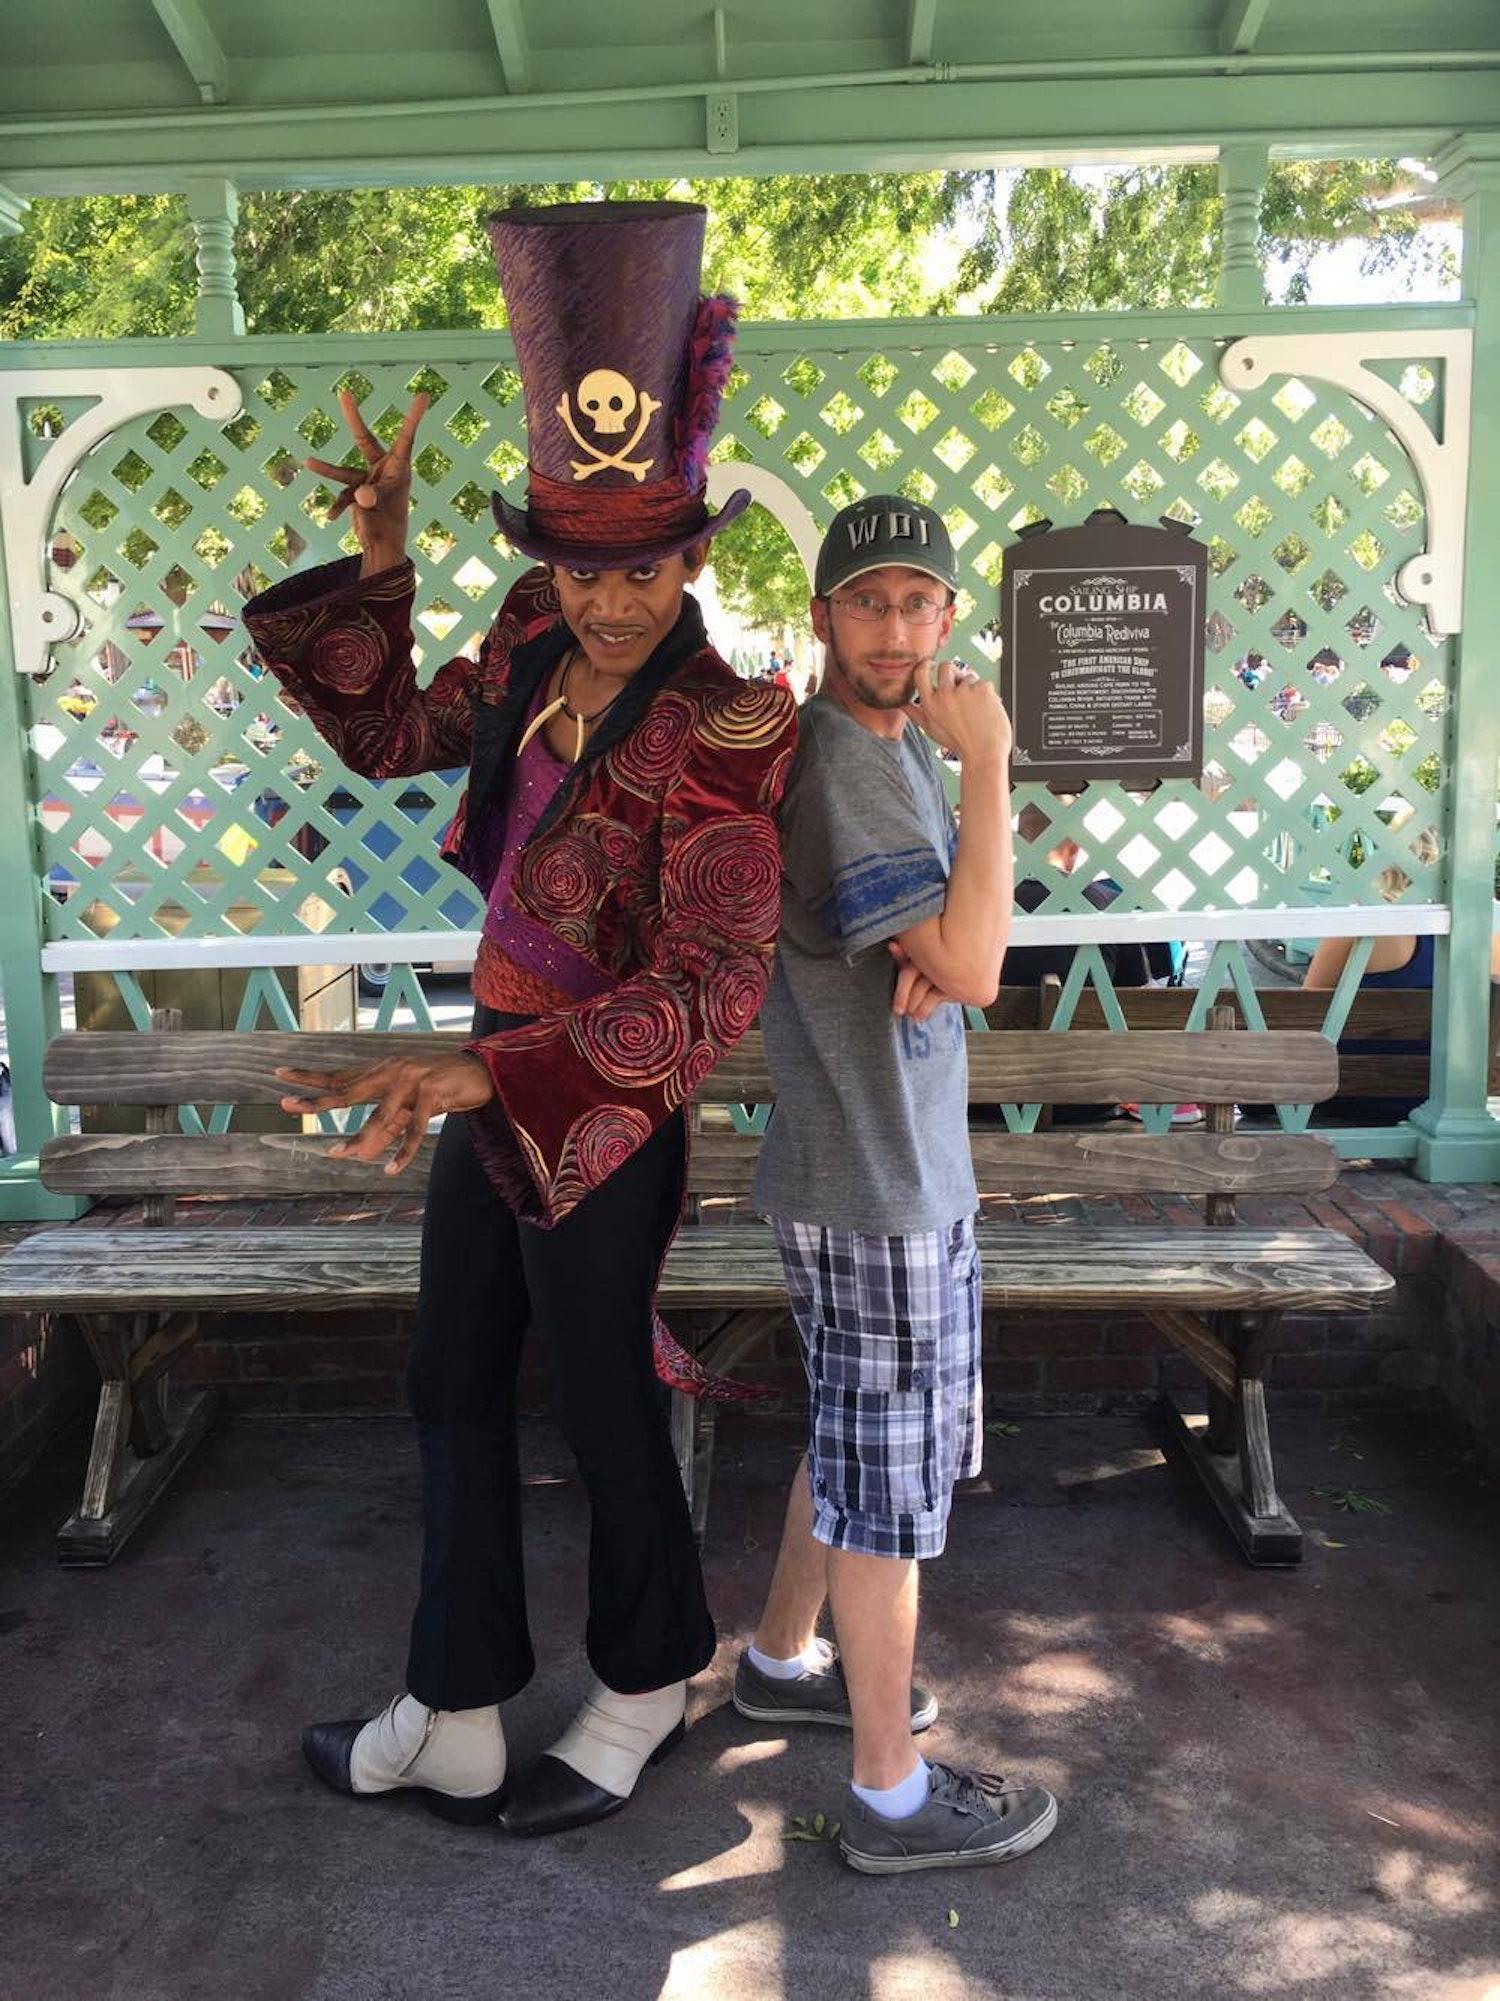 Heimbuch at Disneyland